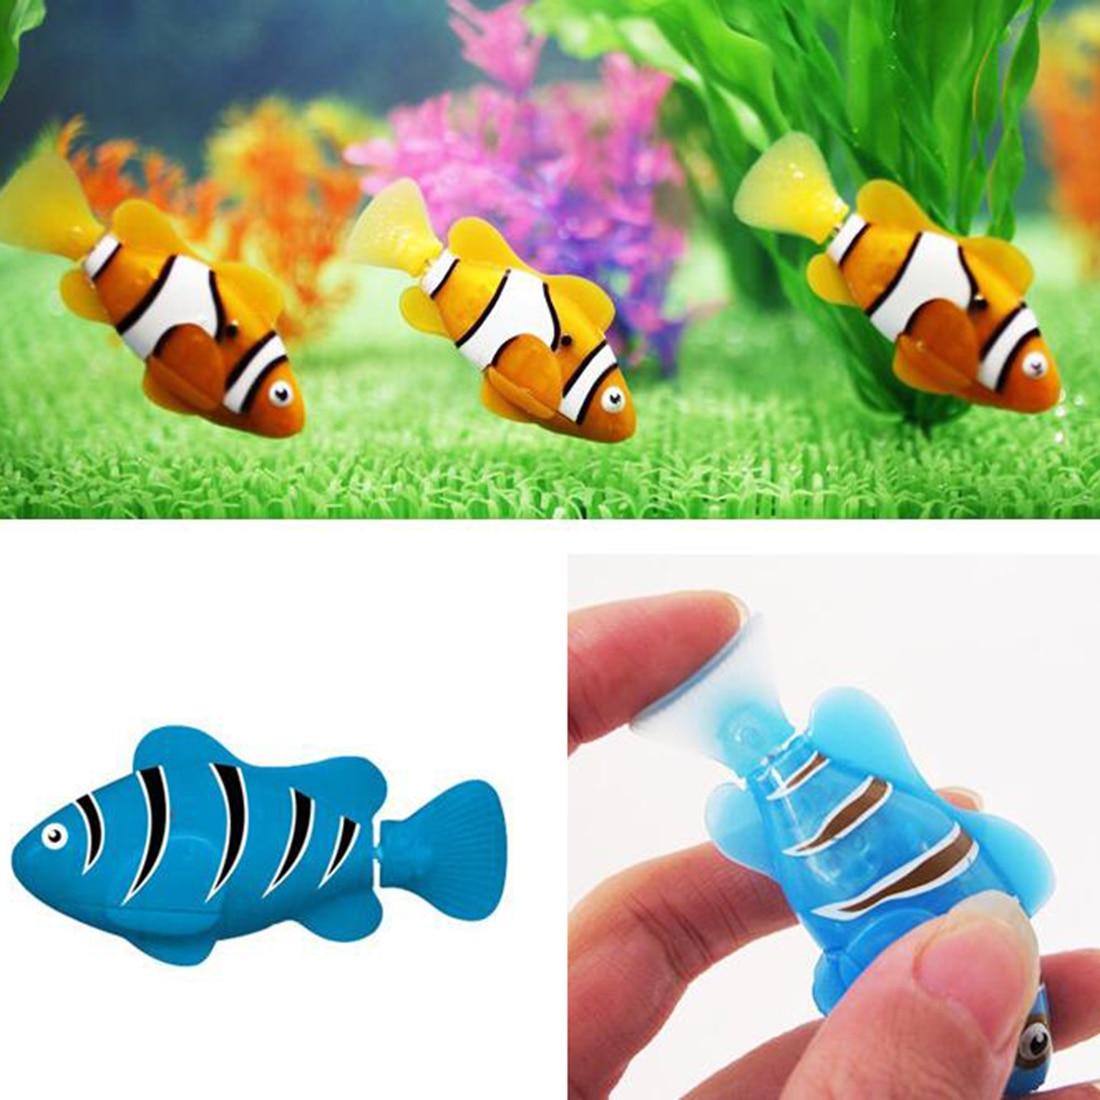 Fish tank toys - Big Sale Robofish Activated Battery Powered Robo Fish Toy Fish Robotic Fish Tank Aquarium Ornaments Decorations